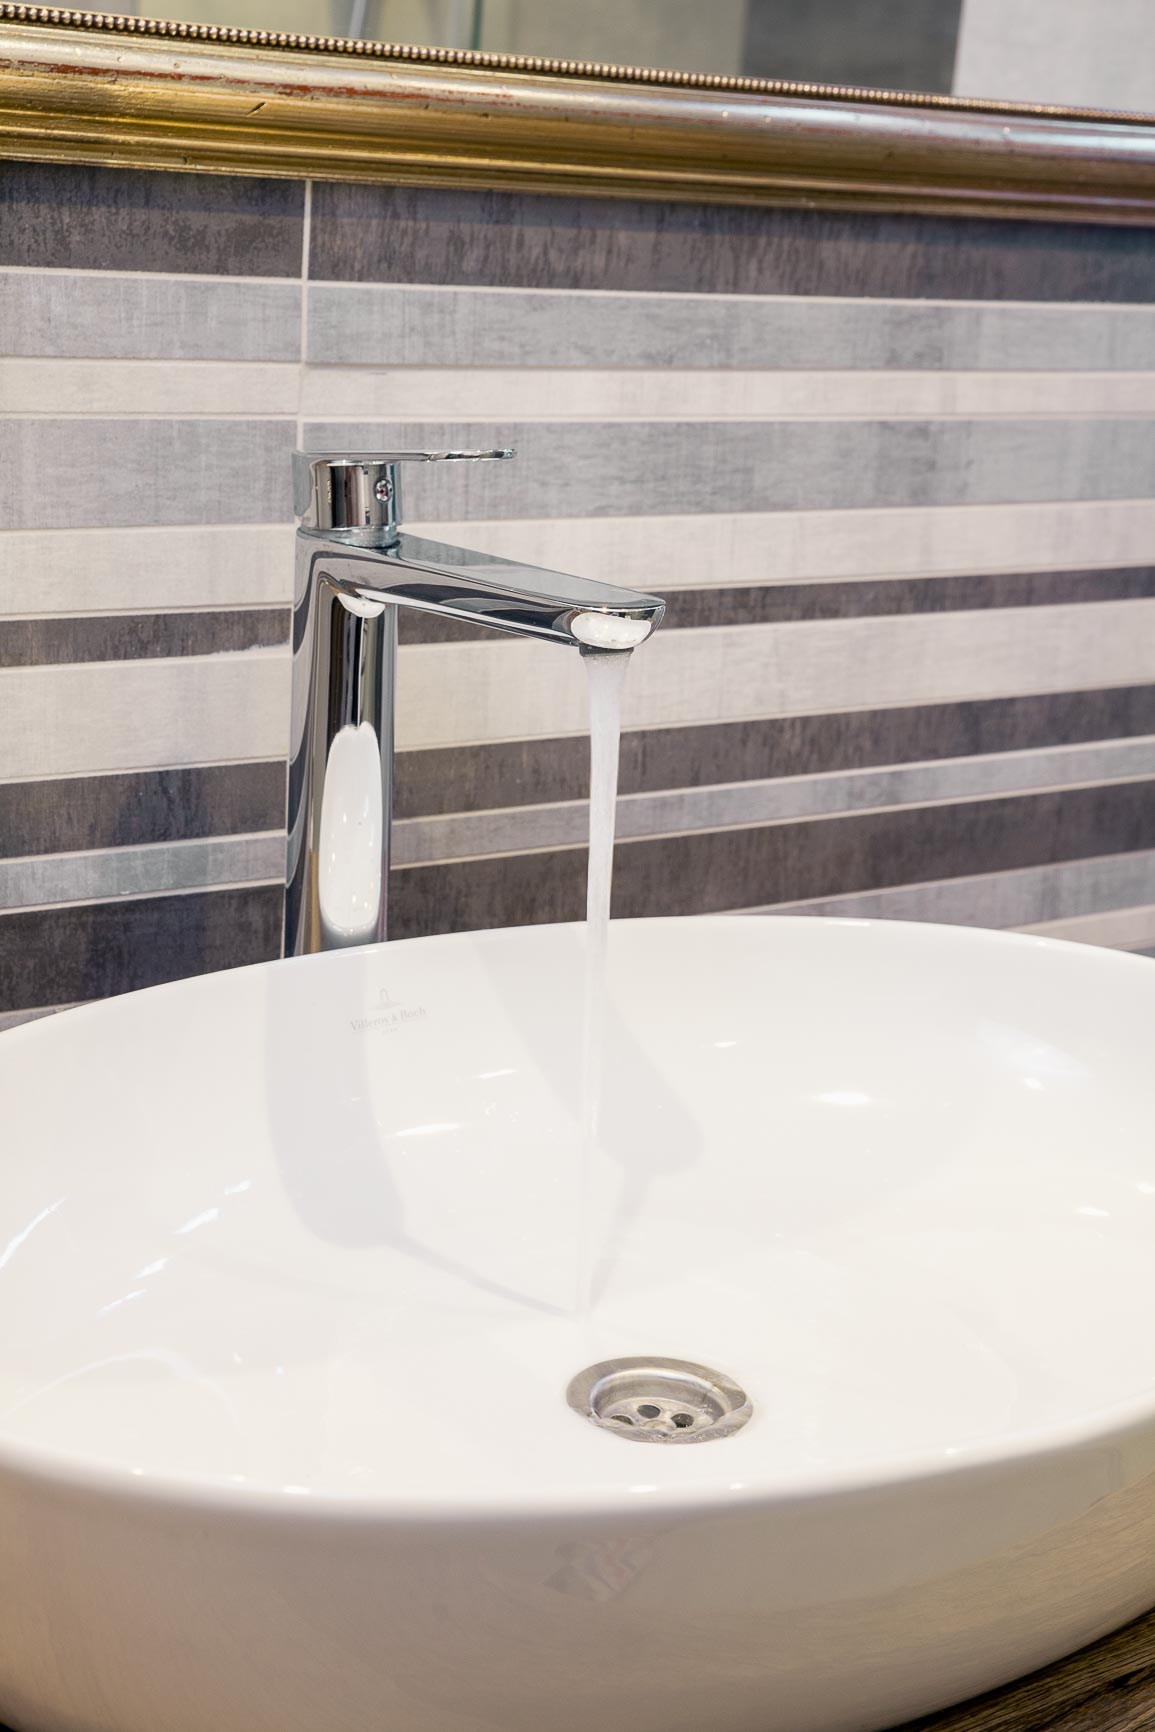 fotografisanje enterijera, renovirano kupatilo